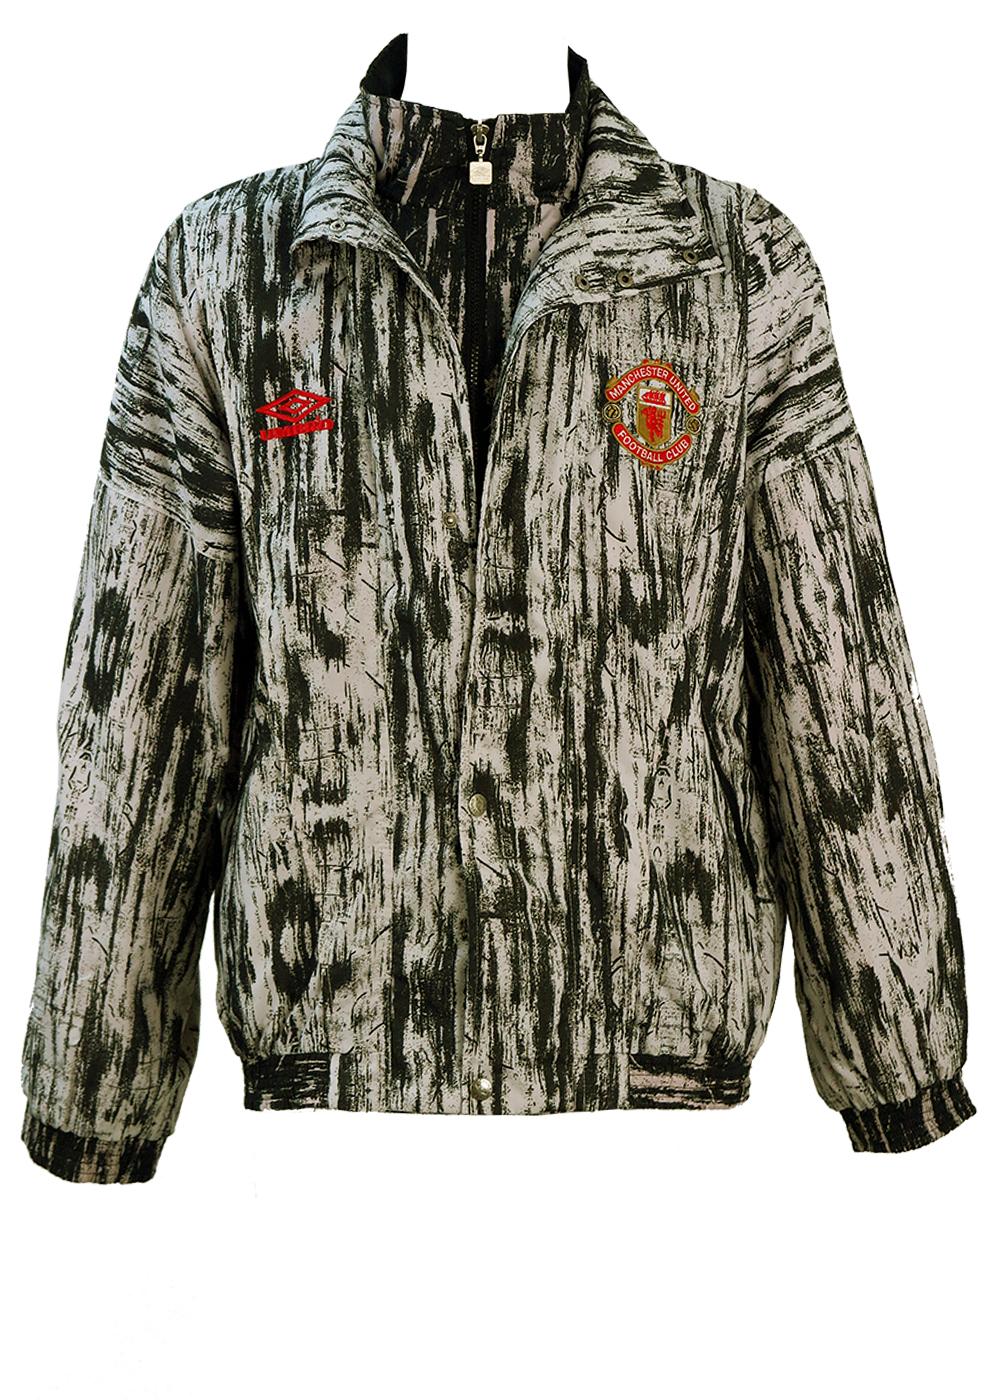 Vintage 90 S Graphic Black White Manchester United Umbro Track Jacket L Xl Reign Vintage